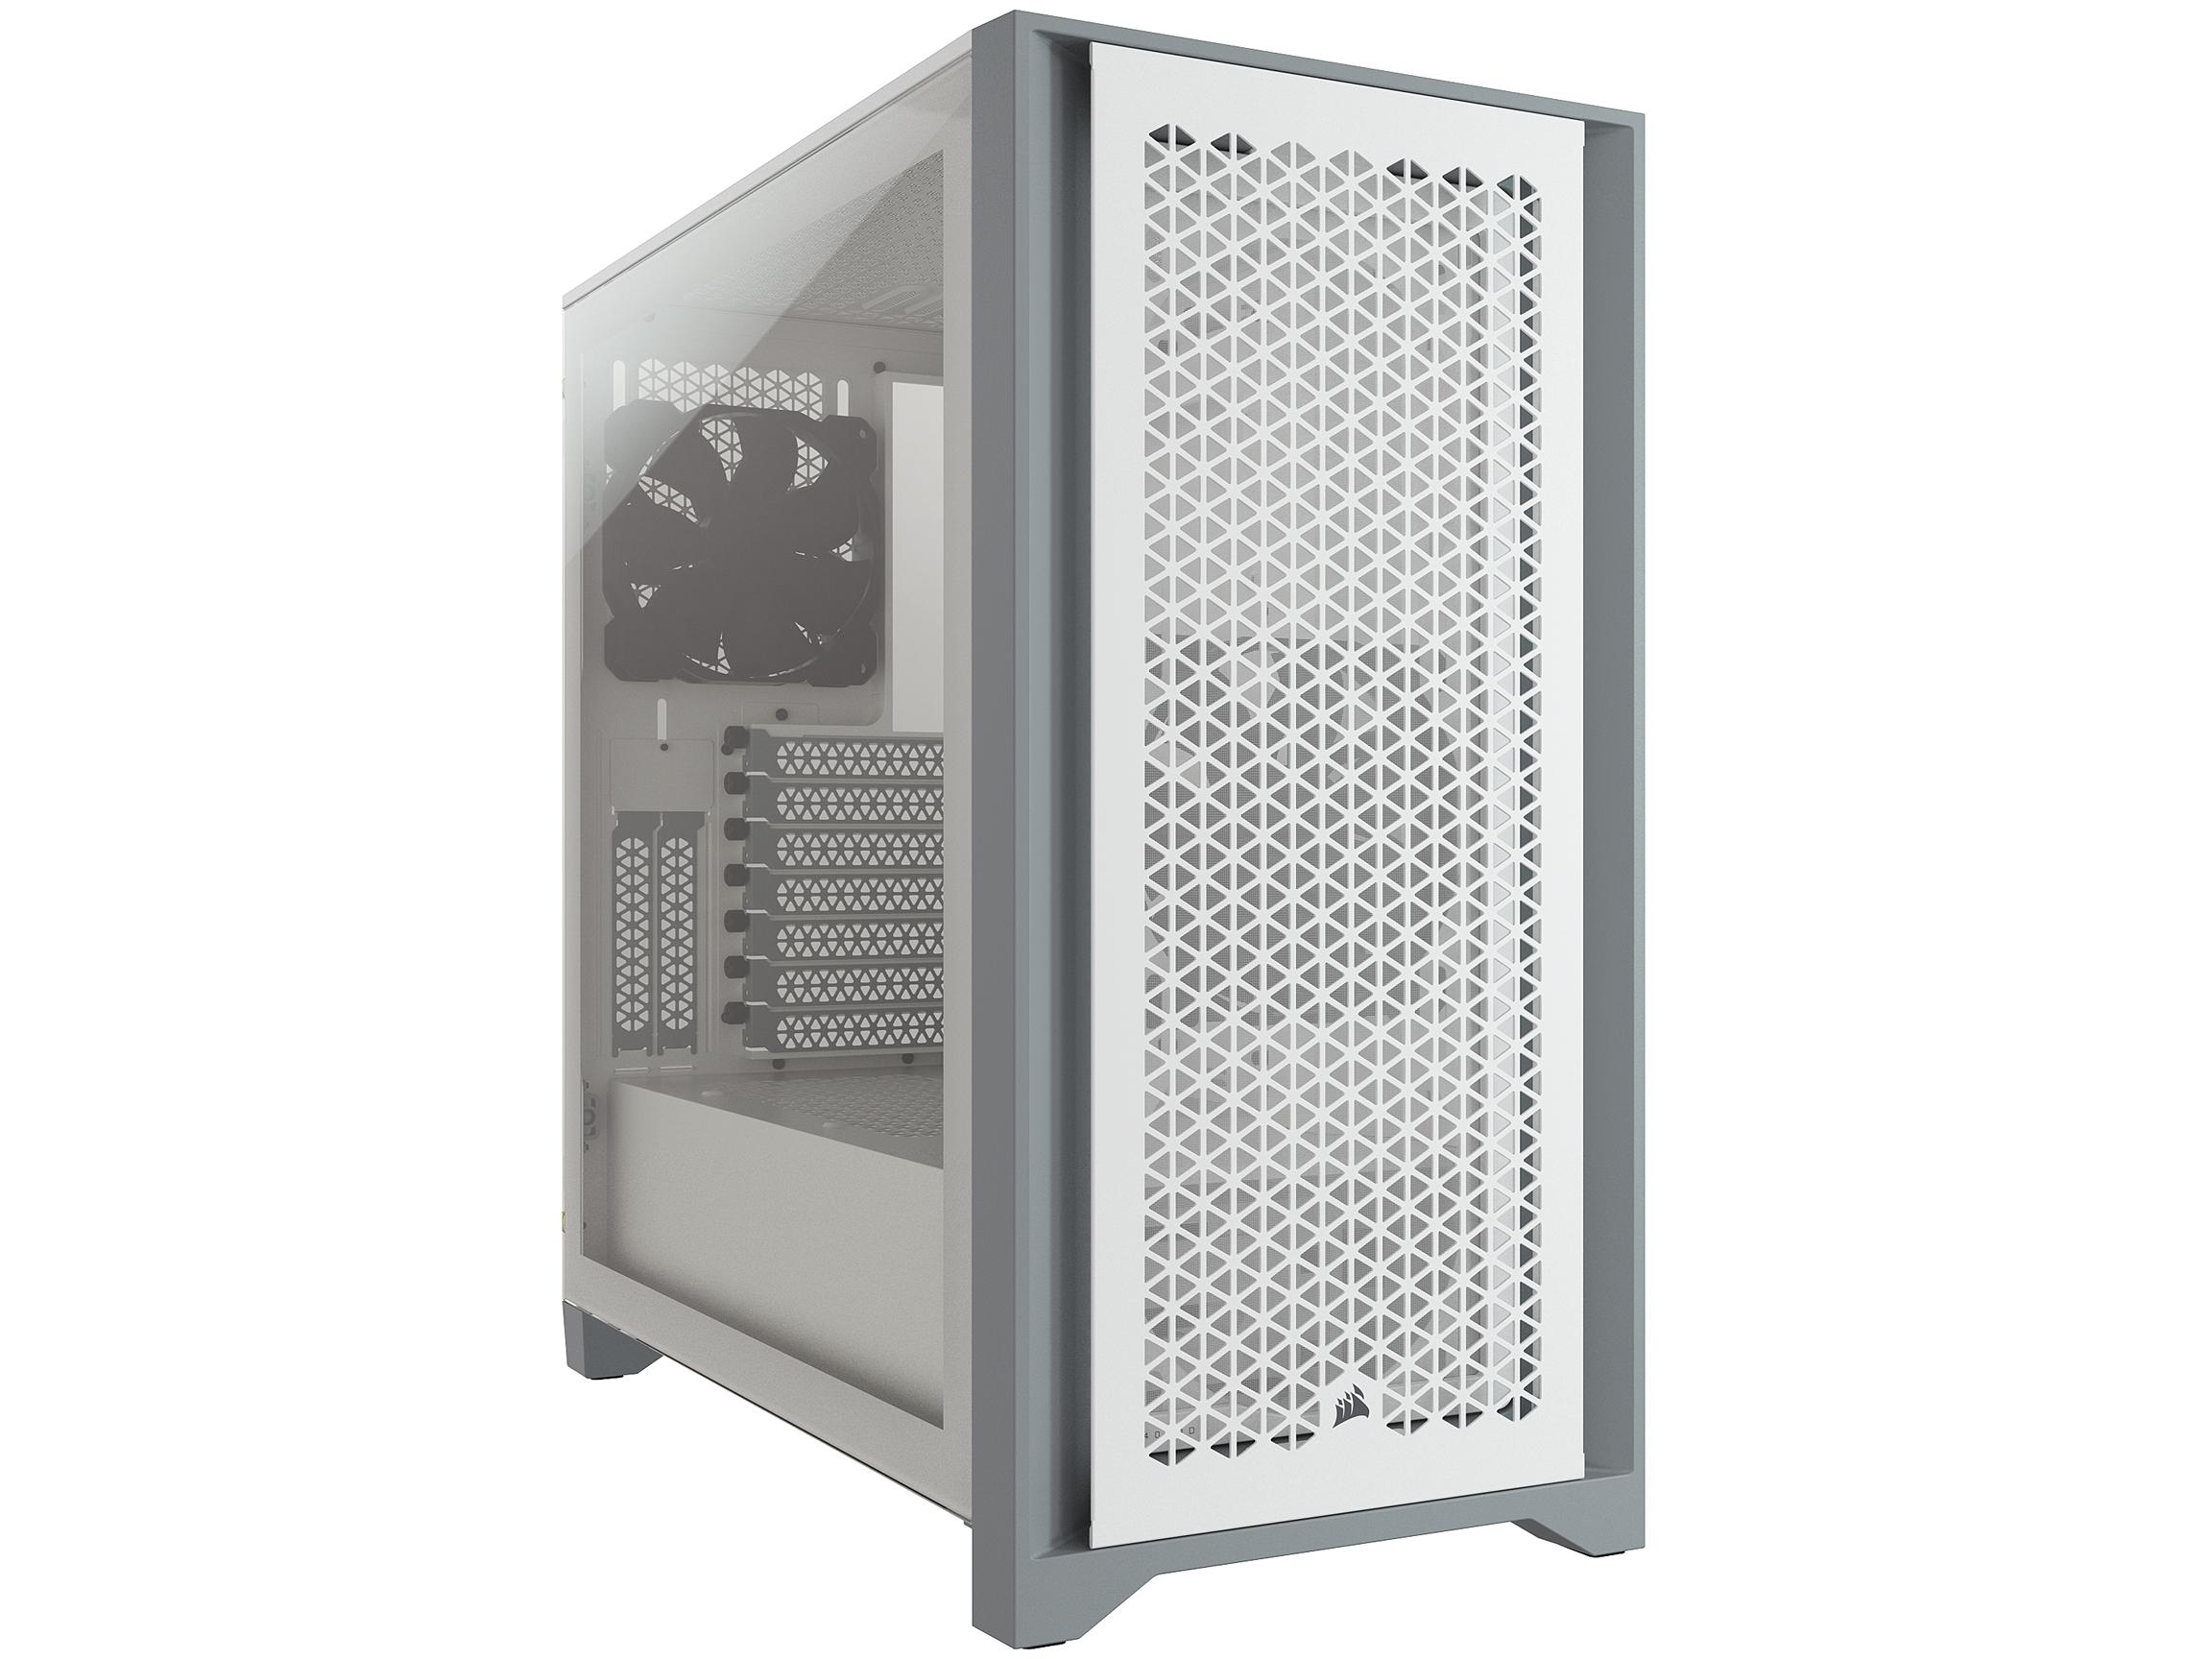 Corsair 4000D Airflow Tempered Glass ATX Mid Tower Computer Case, CC-9011201-WW